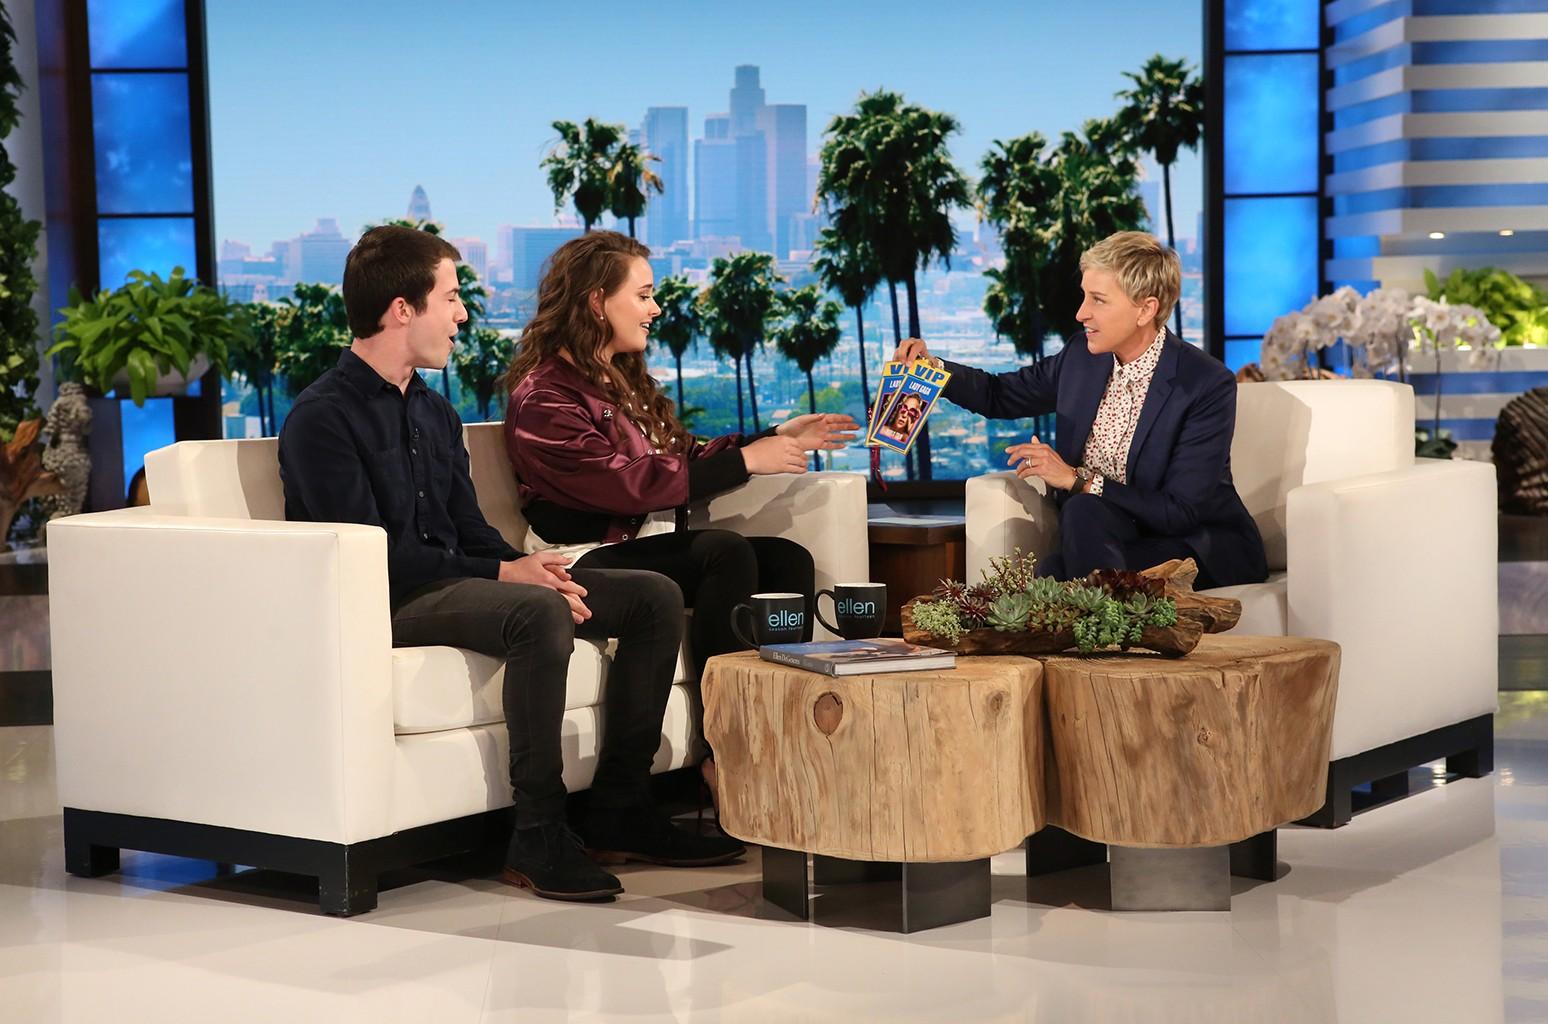 Katherine Langford and Dylan Minnette on The Ellen DeGeneres Show.